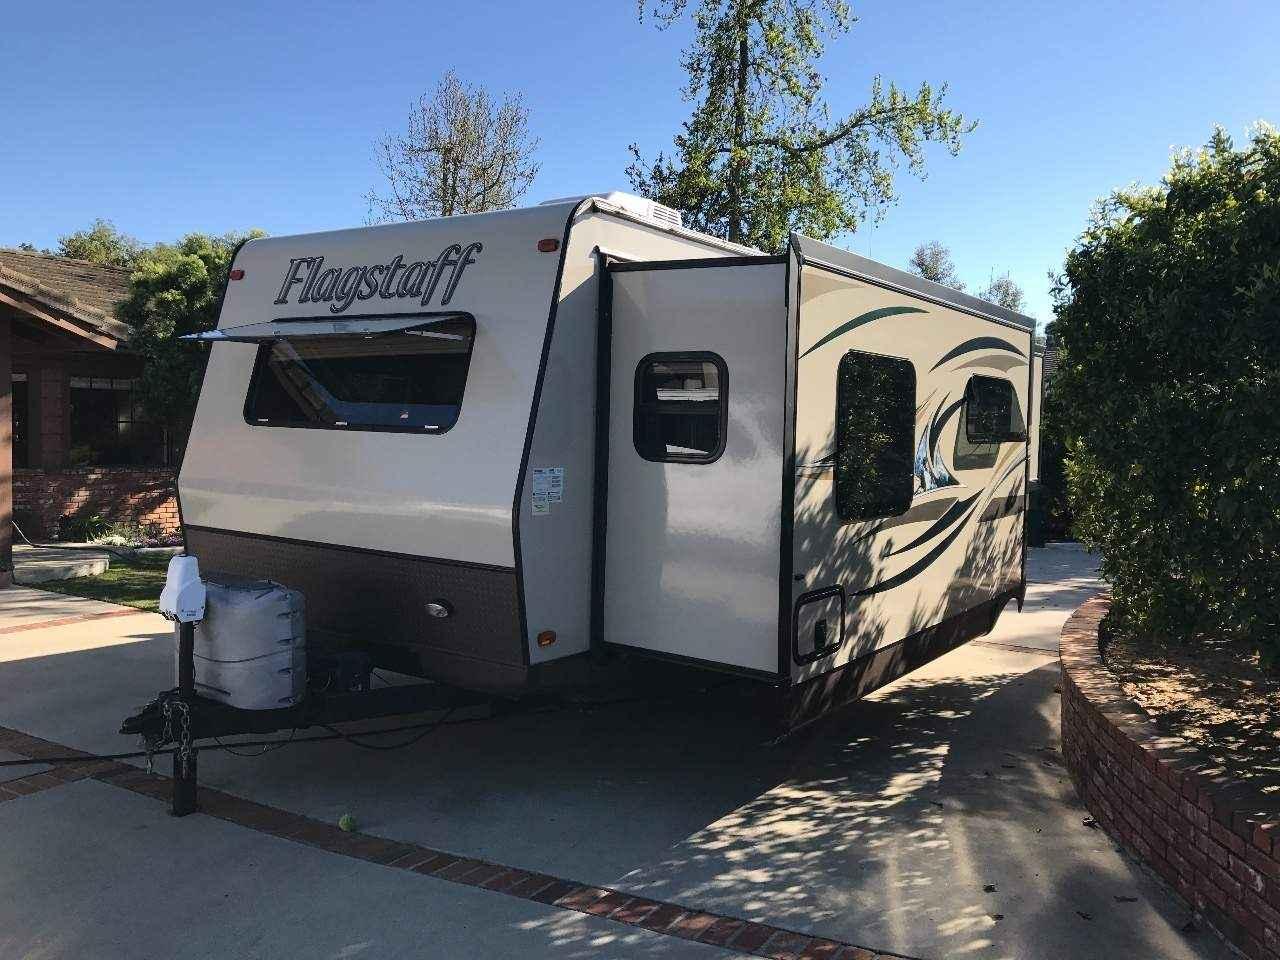 2014 used flagstaff super lite 26fkws travel trailer in california ca. Black Bedroom Furniture Sets. Home Design Ideas